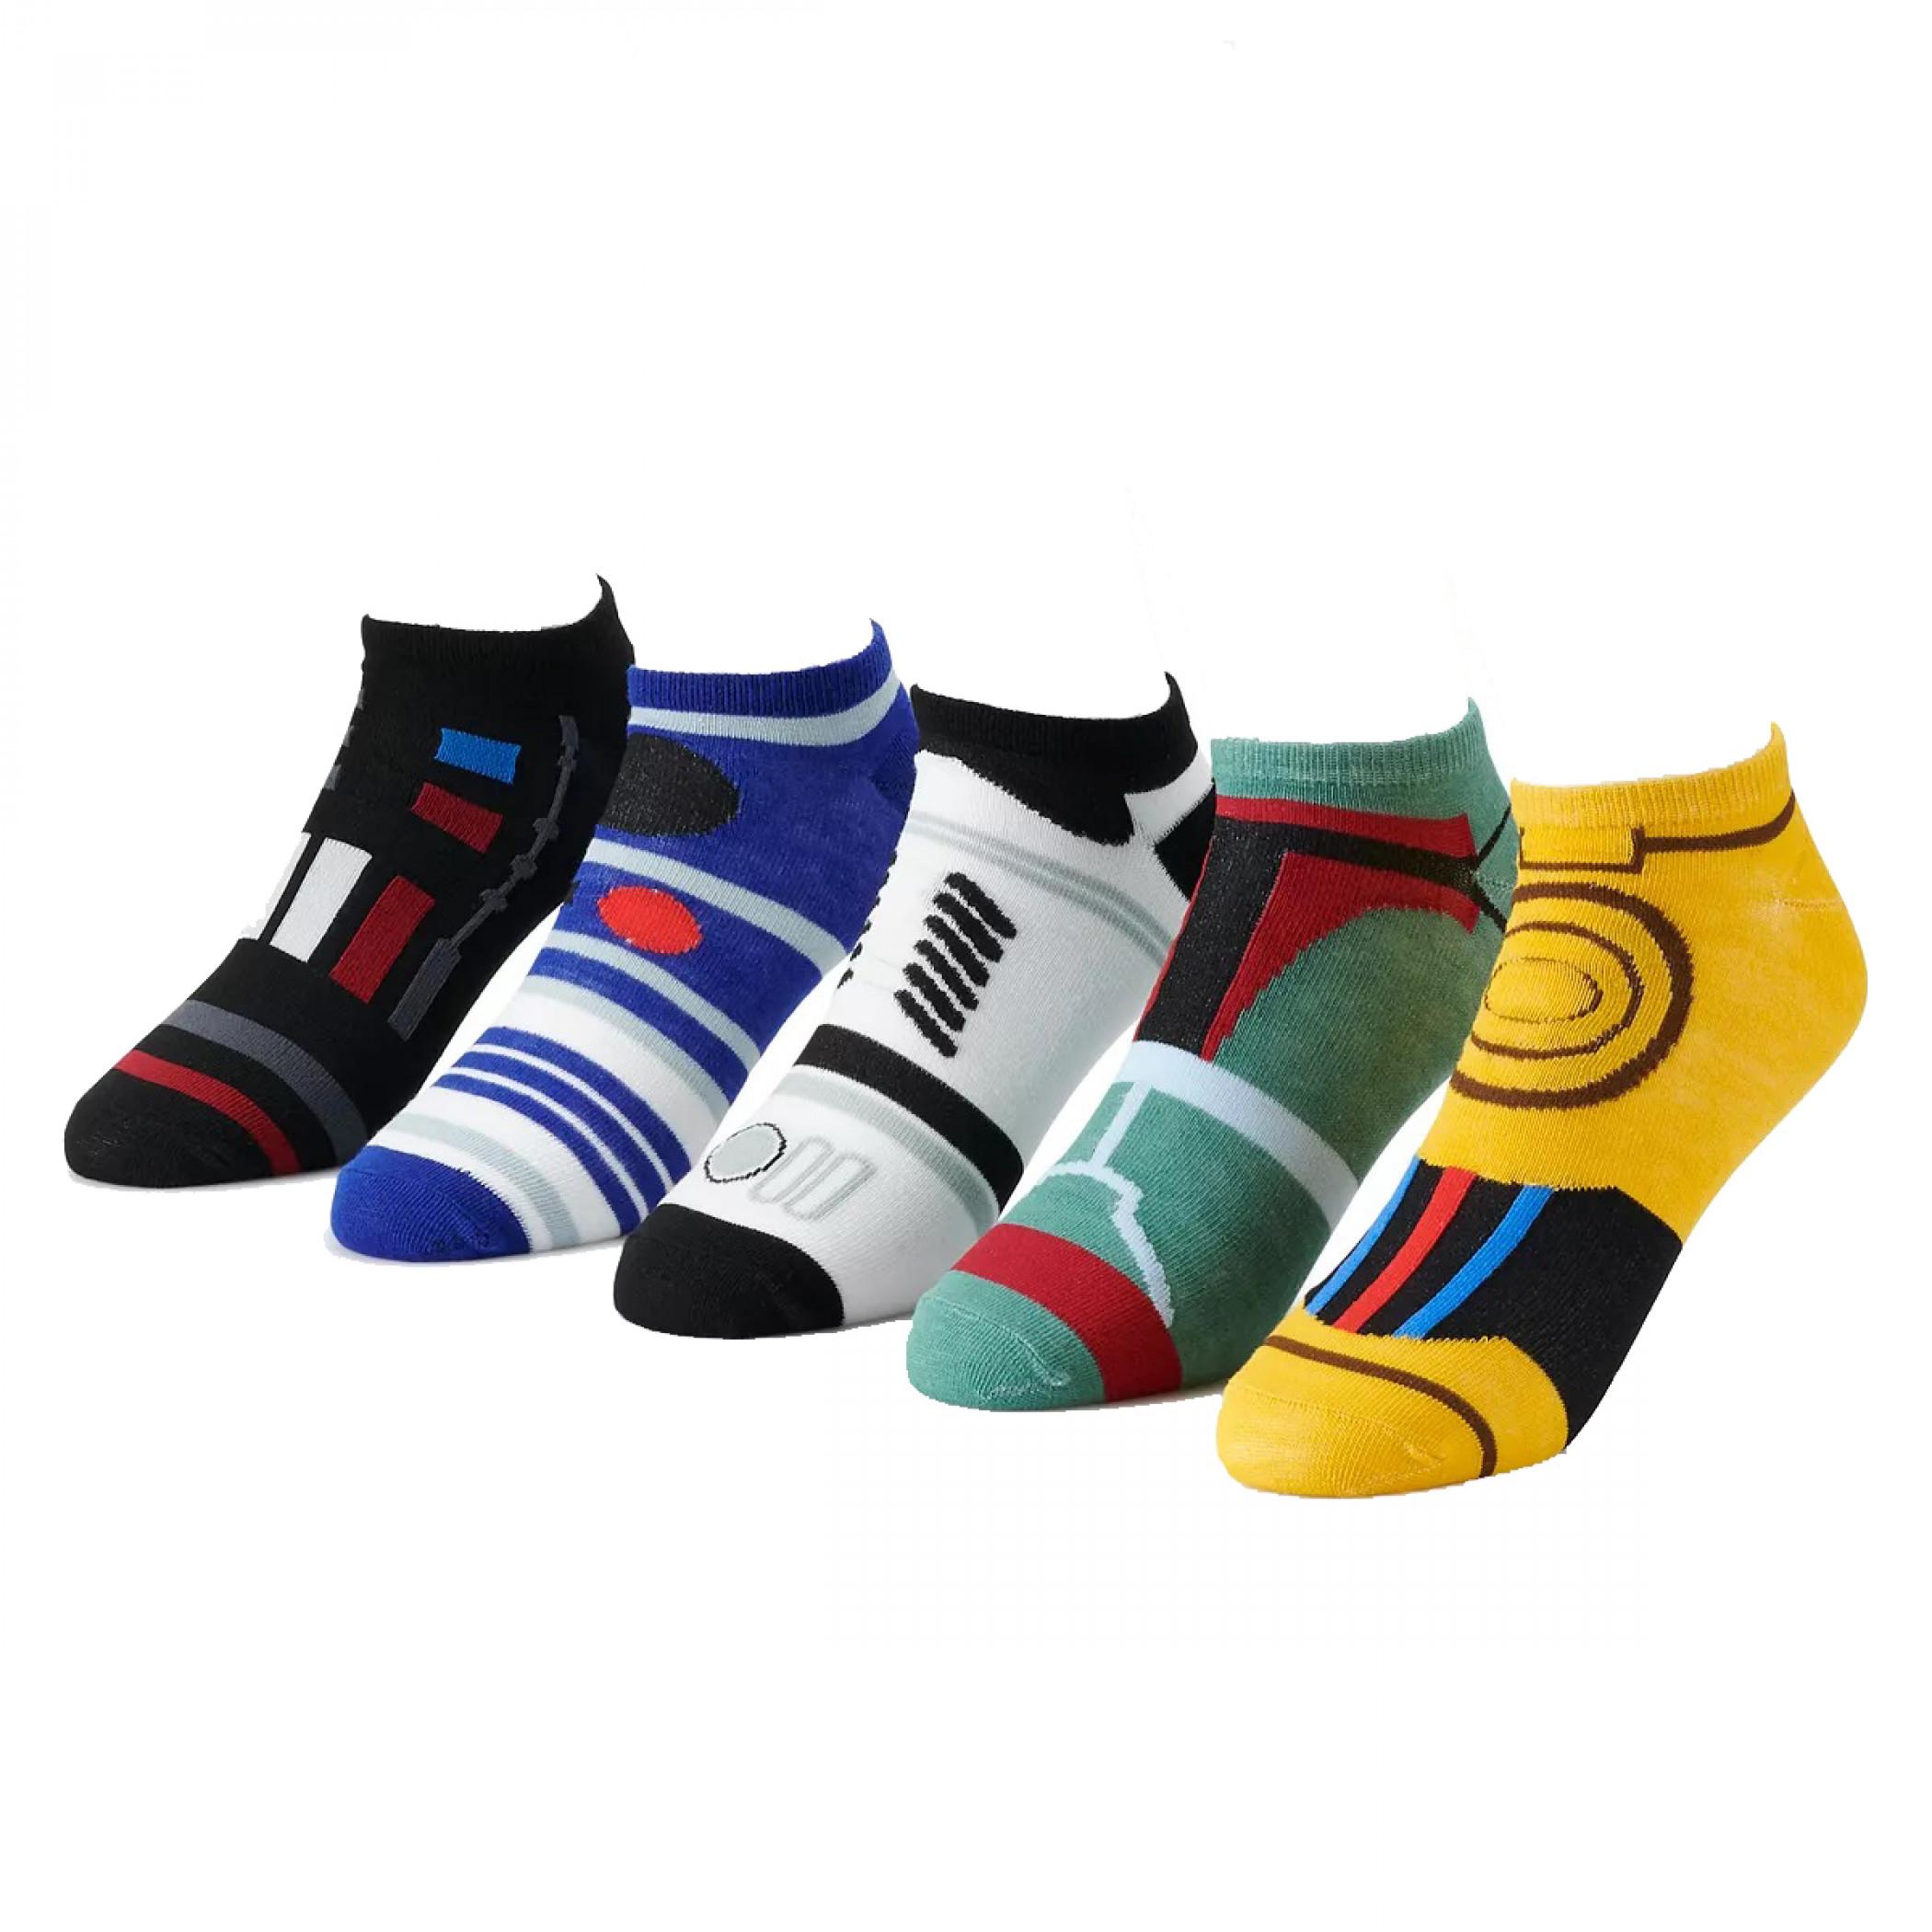 Star Wars Character Costume 5-Pack Shorty Socks